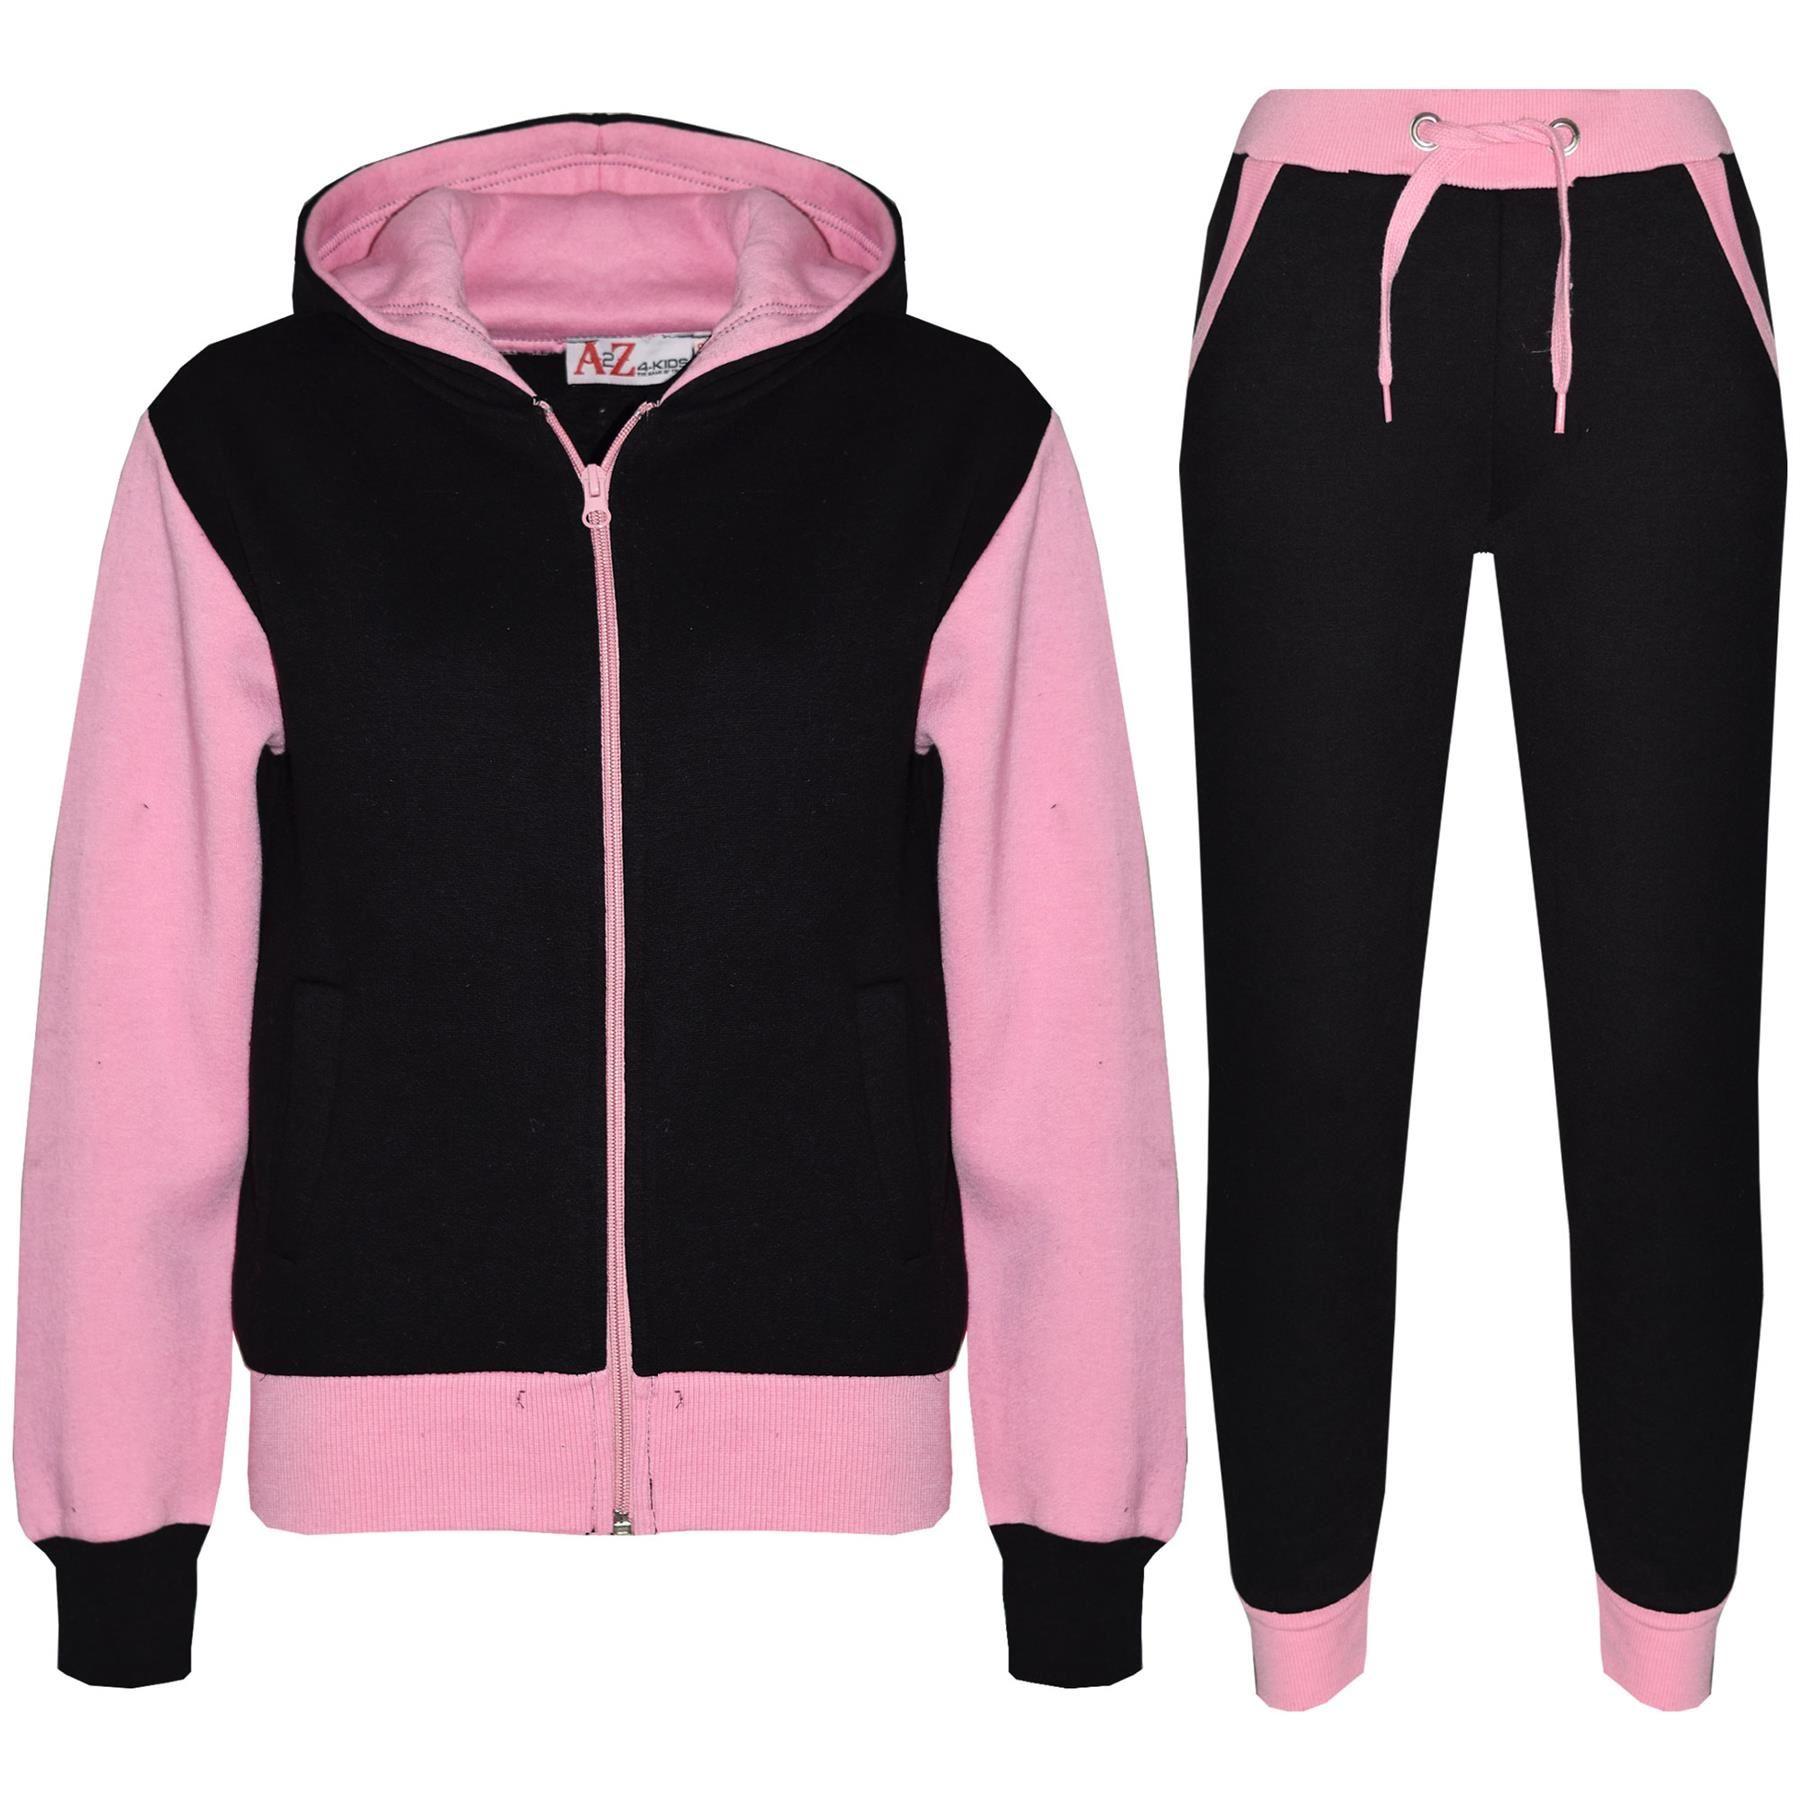 Kids Tracksuit Girls Boys Fleece Hooded Top Bottom Set Jogging Pullover Suit Jogger 7-13Yr